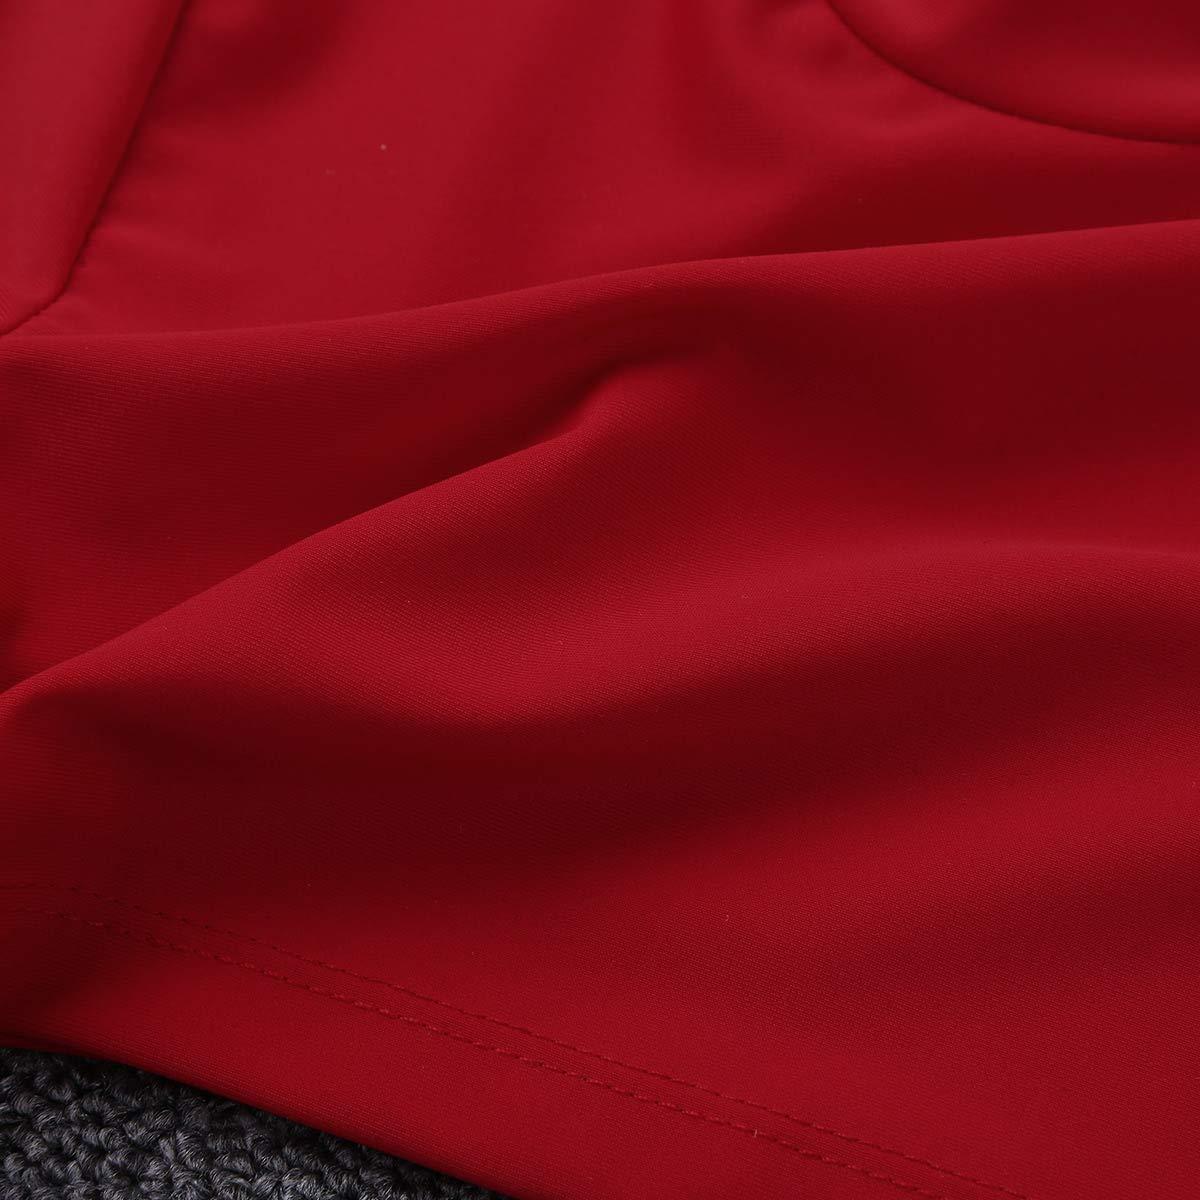 dPois Girls Athletic Tshirt Long Sleeve Cheerleading Turtleneck Crop Top for Dancing Yoga Gymnastic Performance Workout